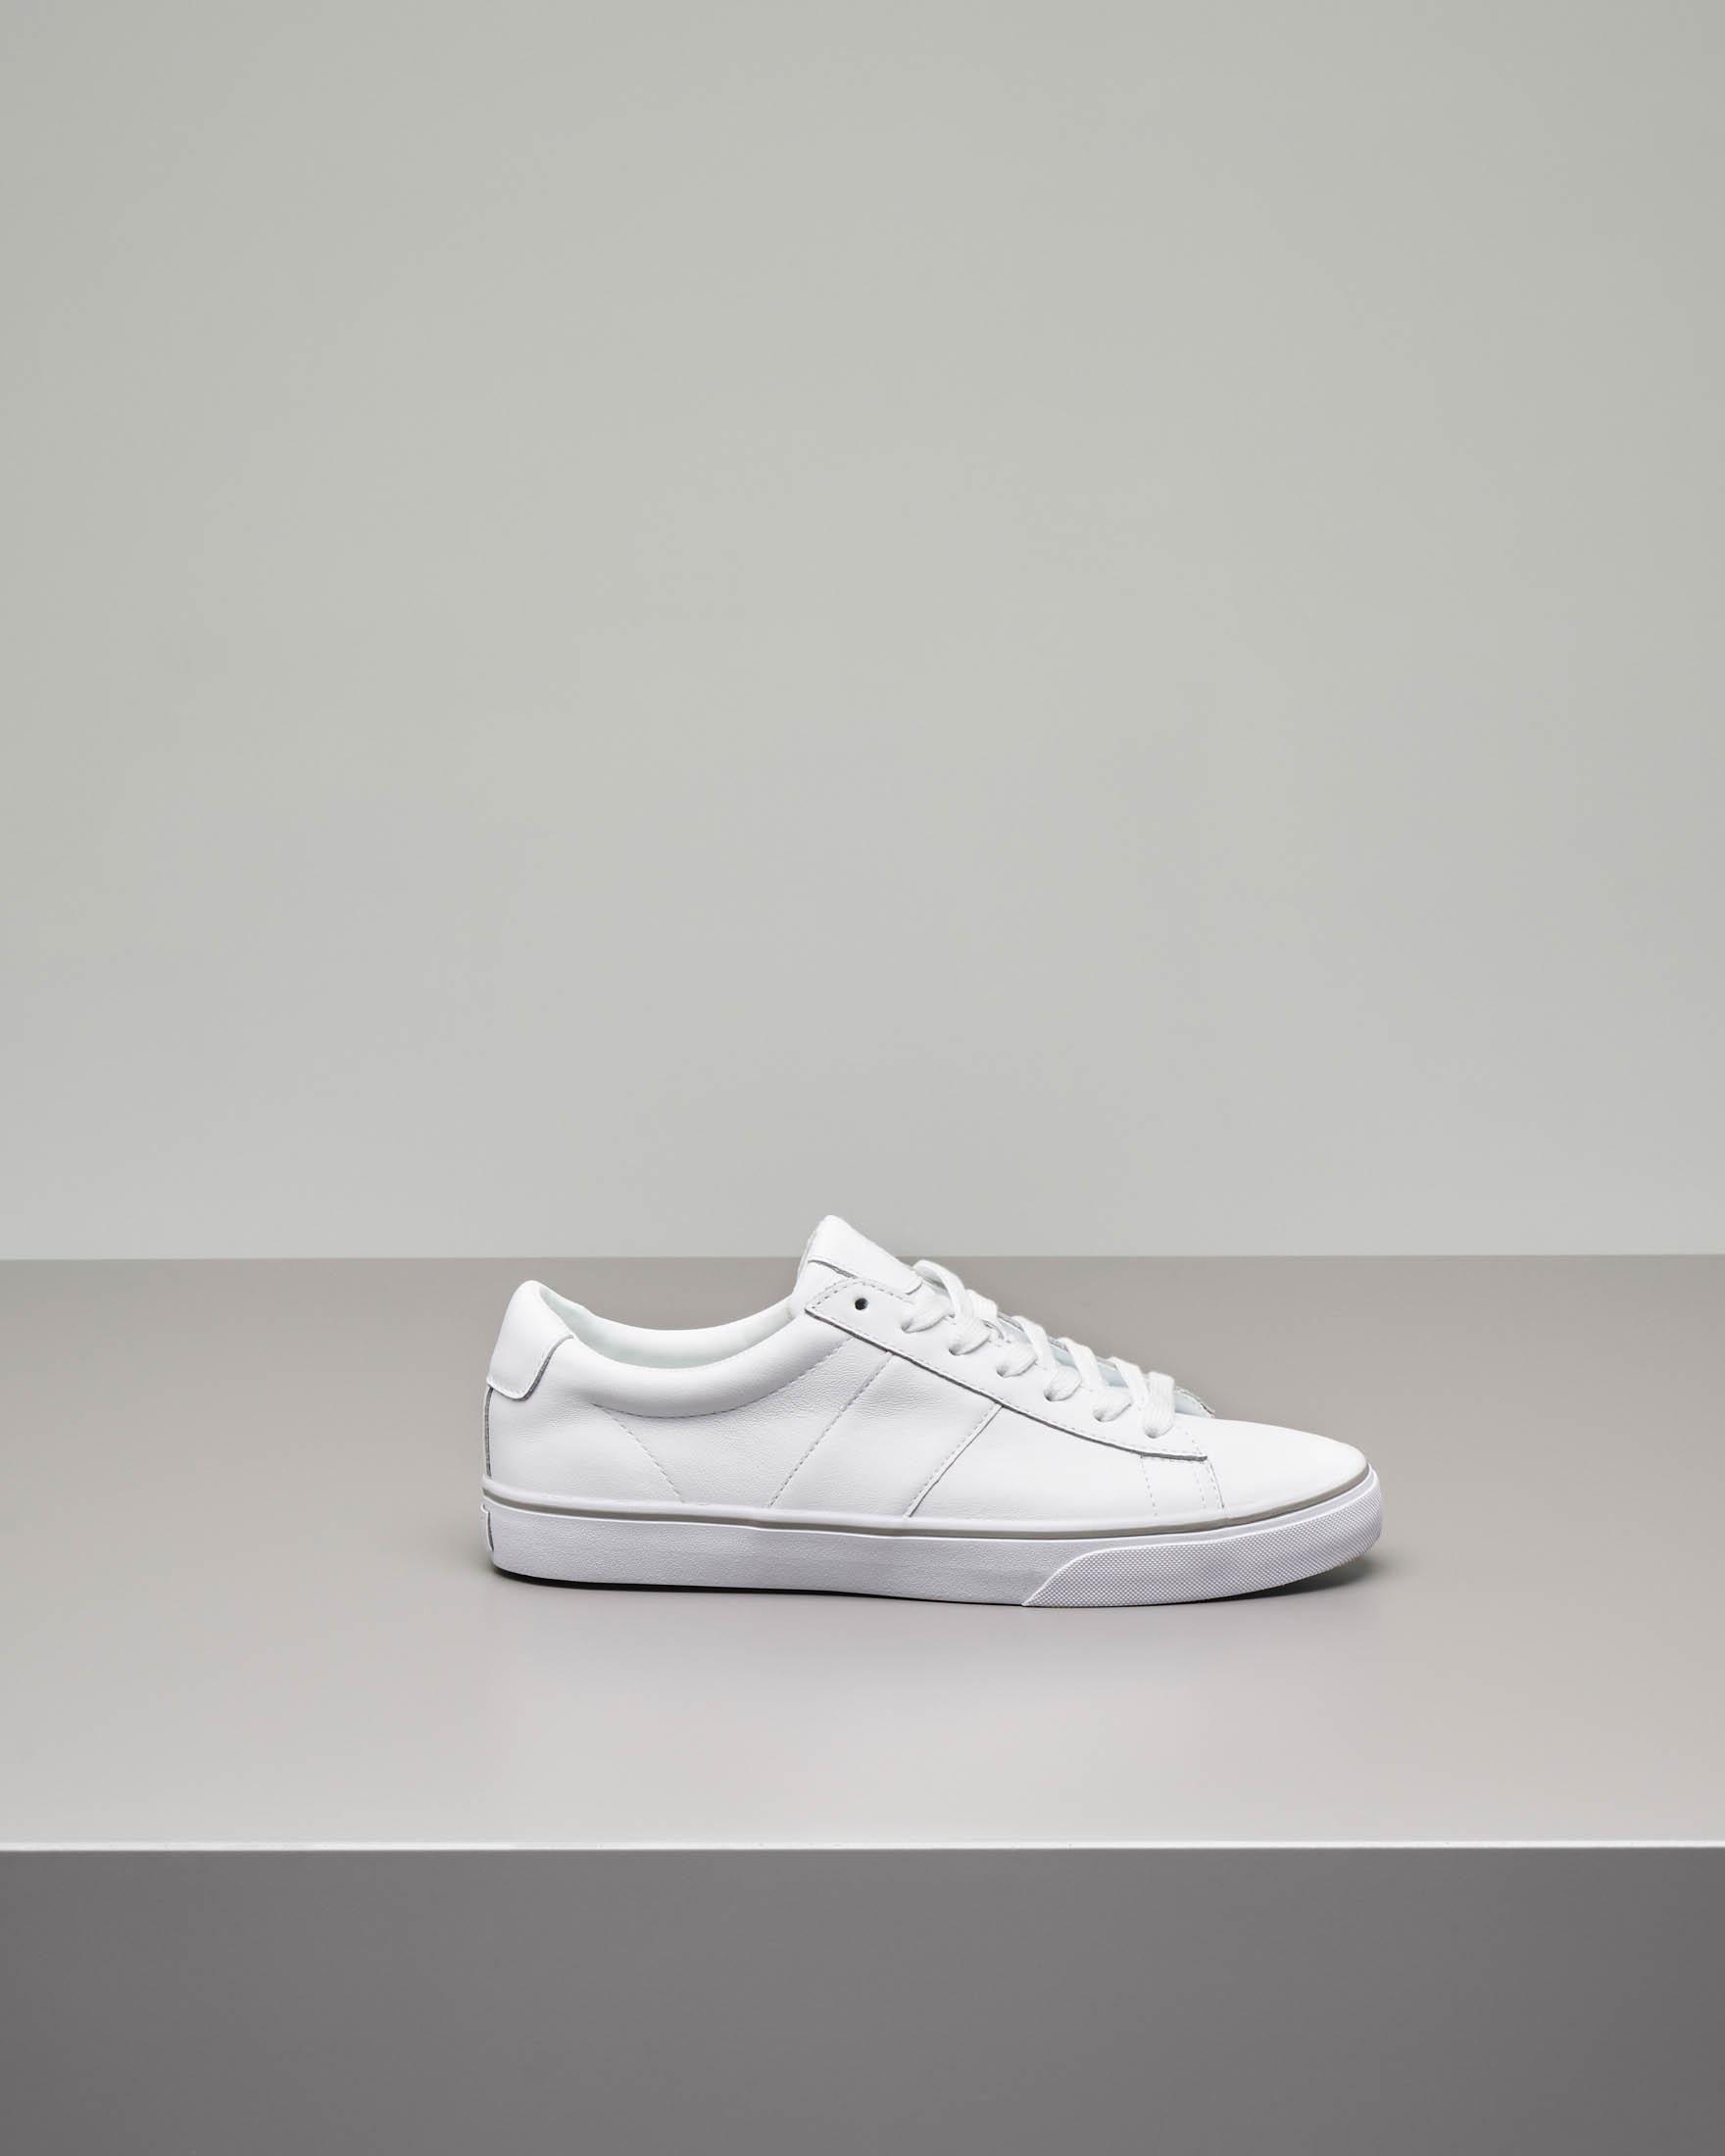 d082d15f97f2c5 Sneakers Sayer bianche in pelle | Pellizzari E-commerce